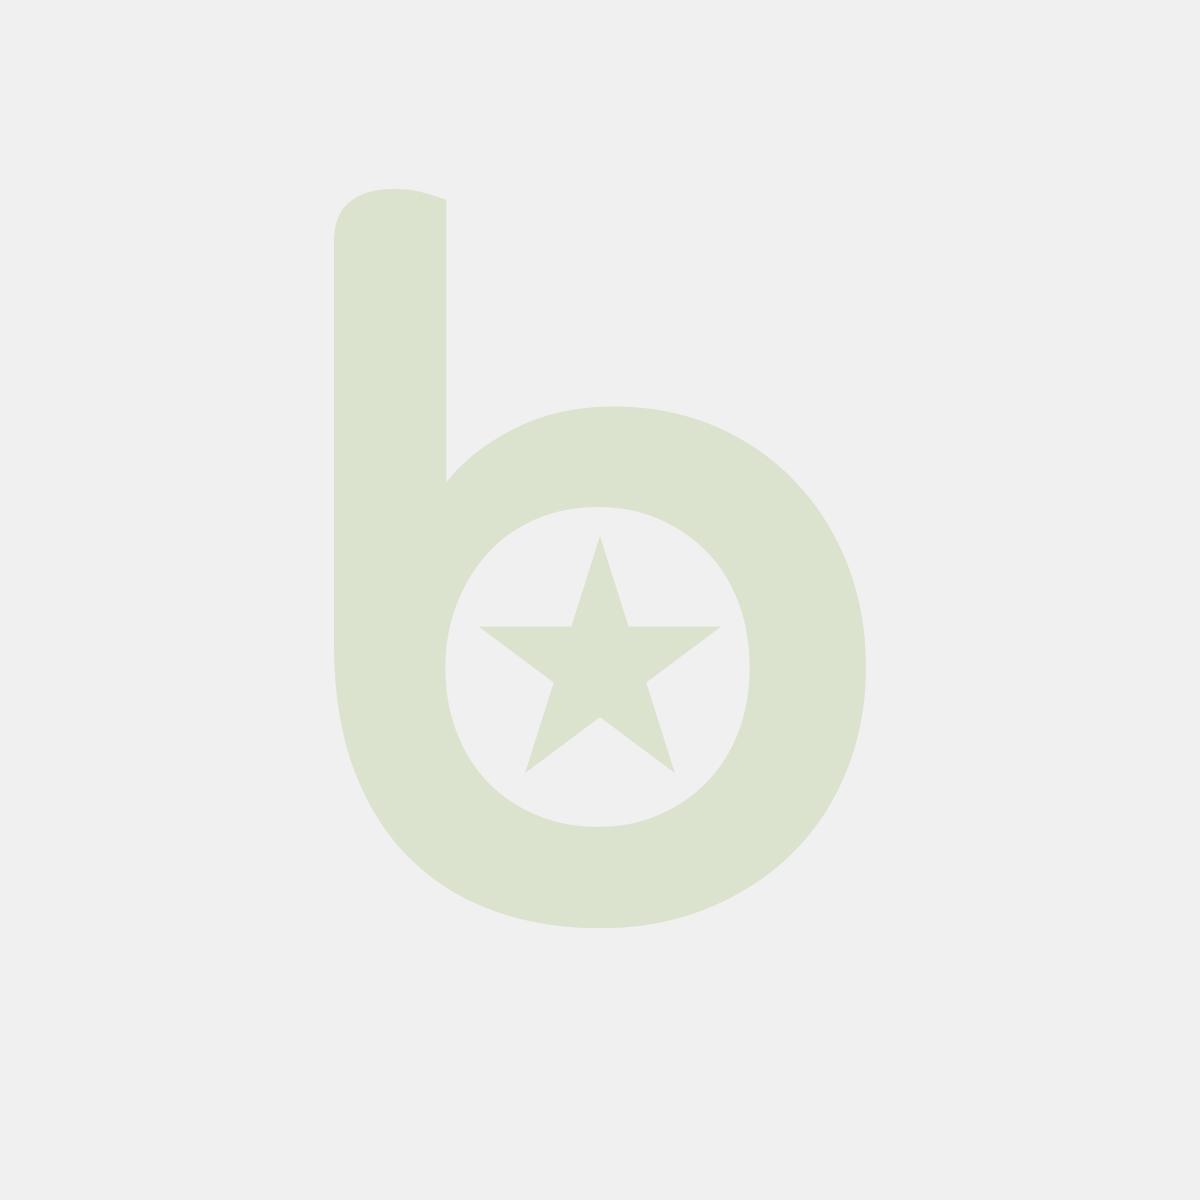 Zeszyt A5 60 linia mix wzorów INTERDRUK